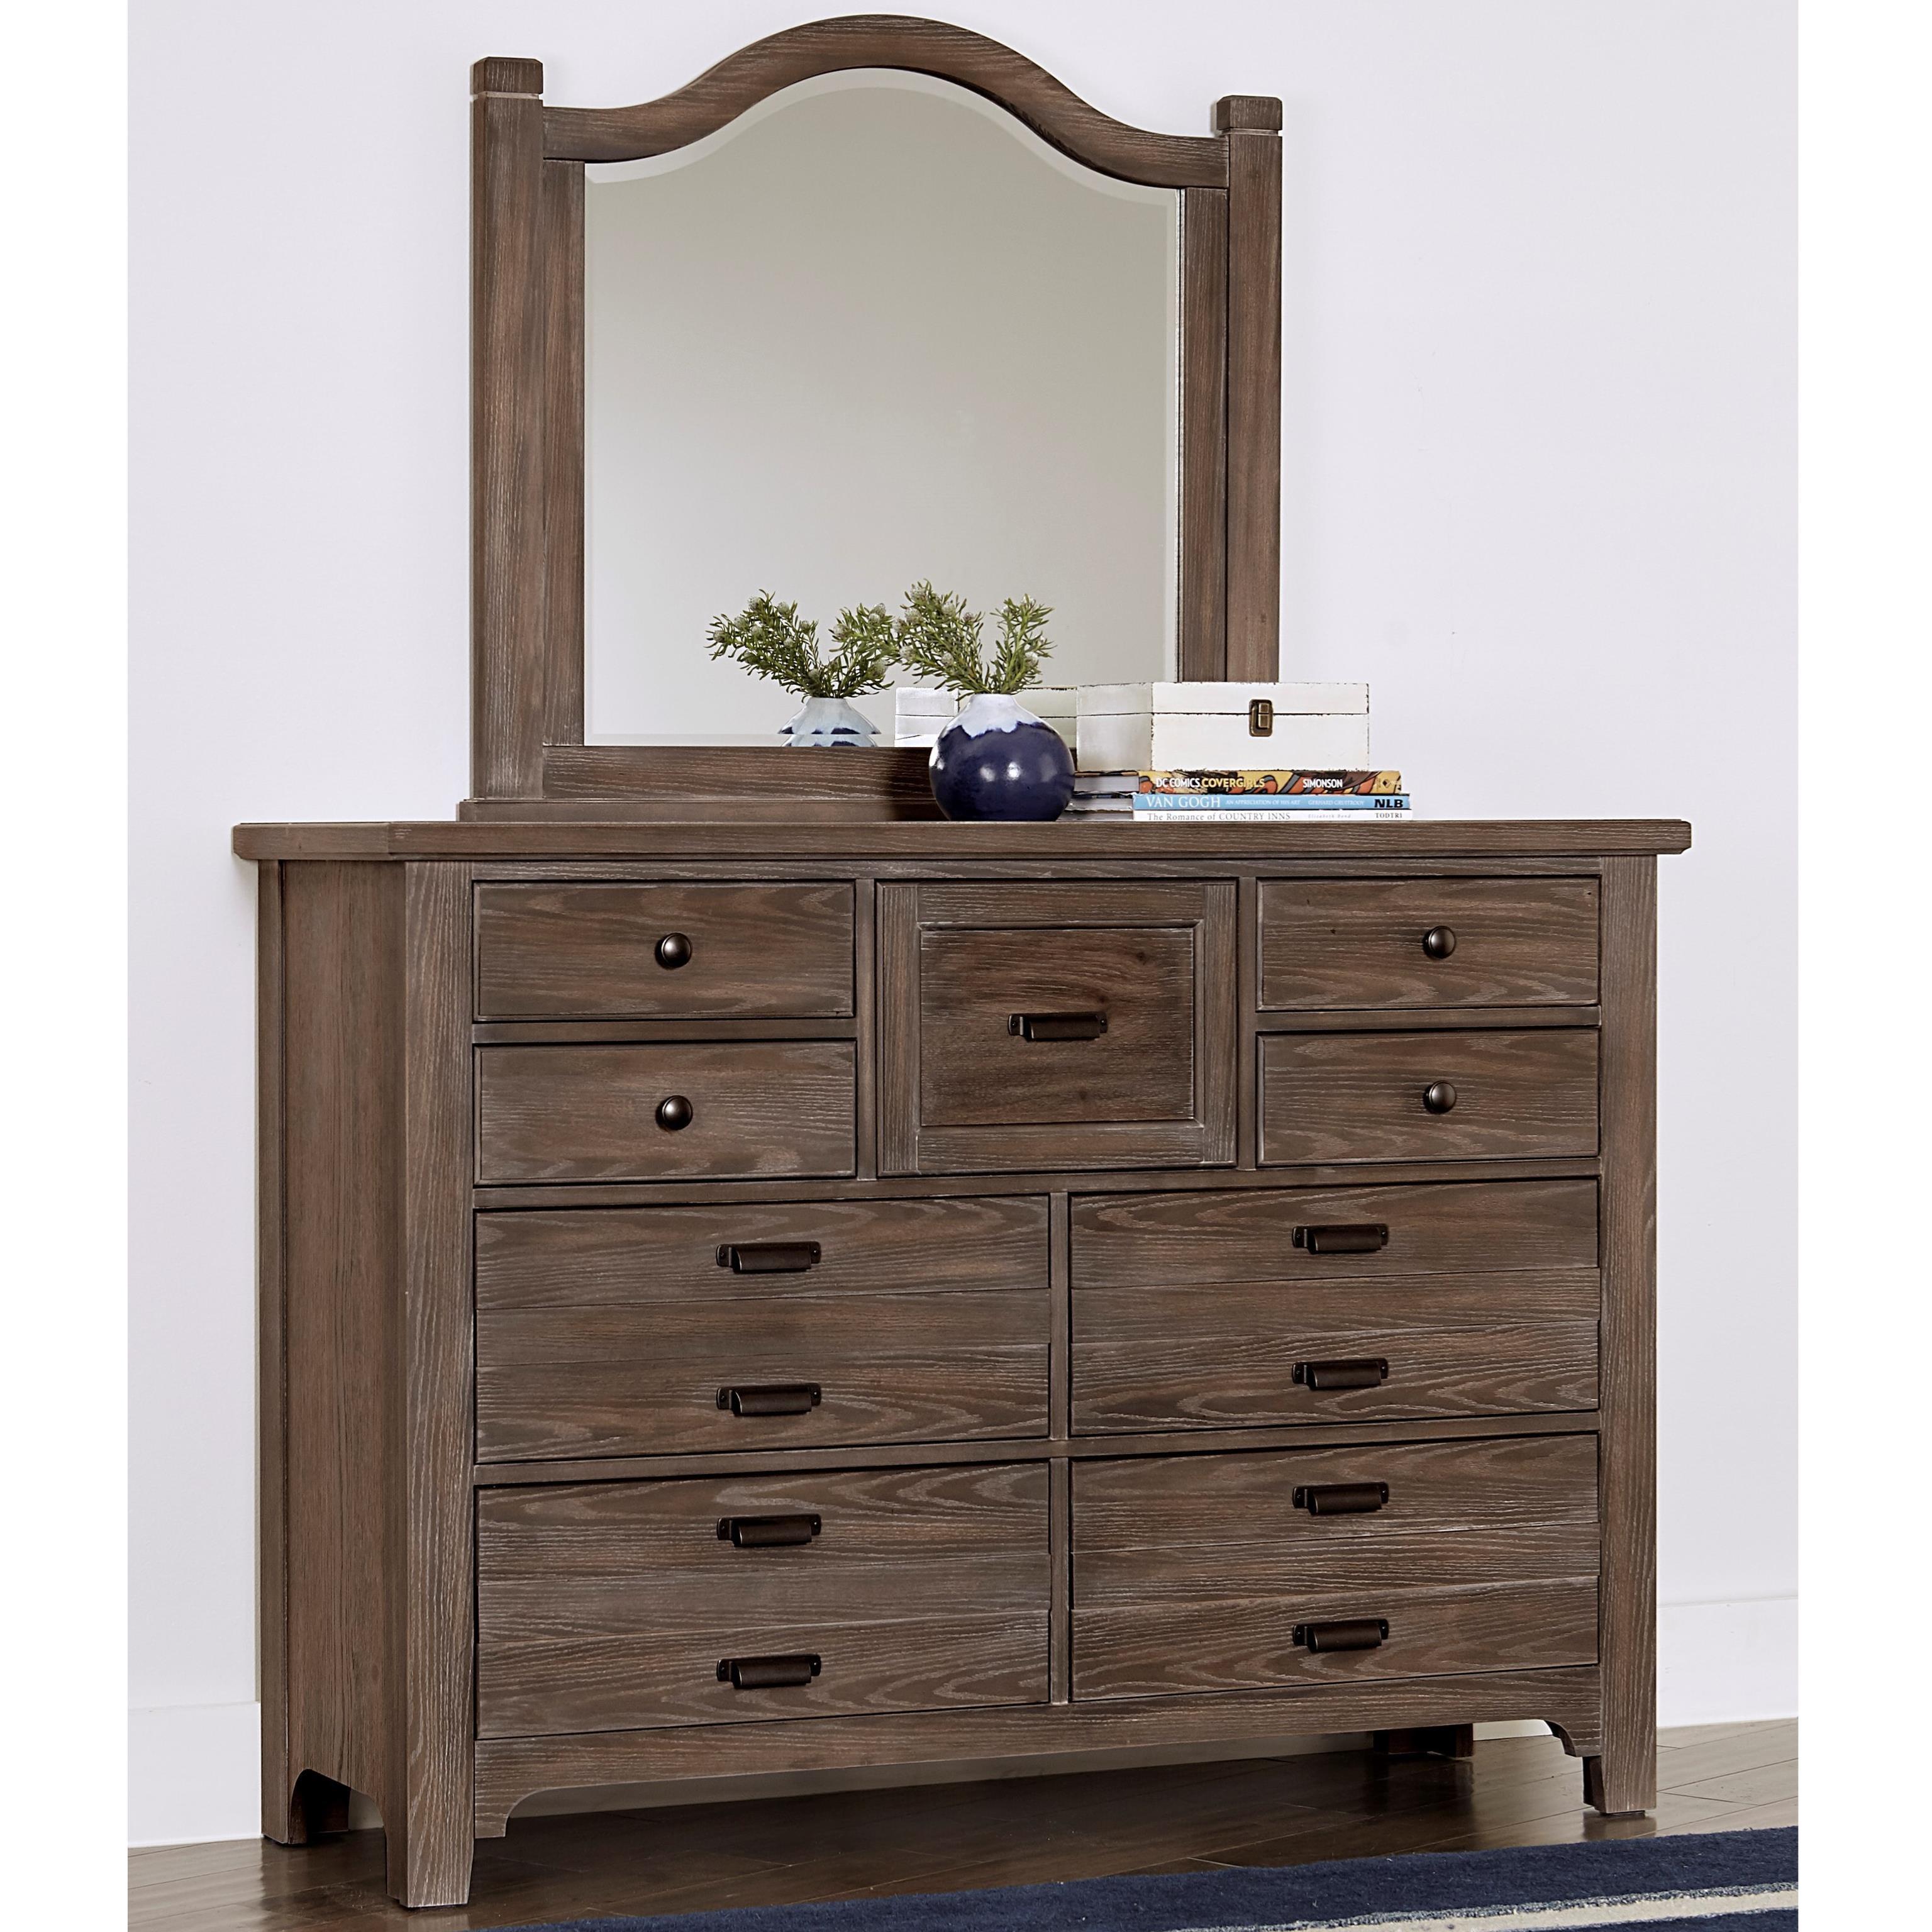 Bungalow Master Dresser & Master Arch Mirror by Vaughan-Bassett at Crowley Furniture & Mattress